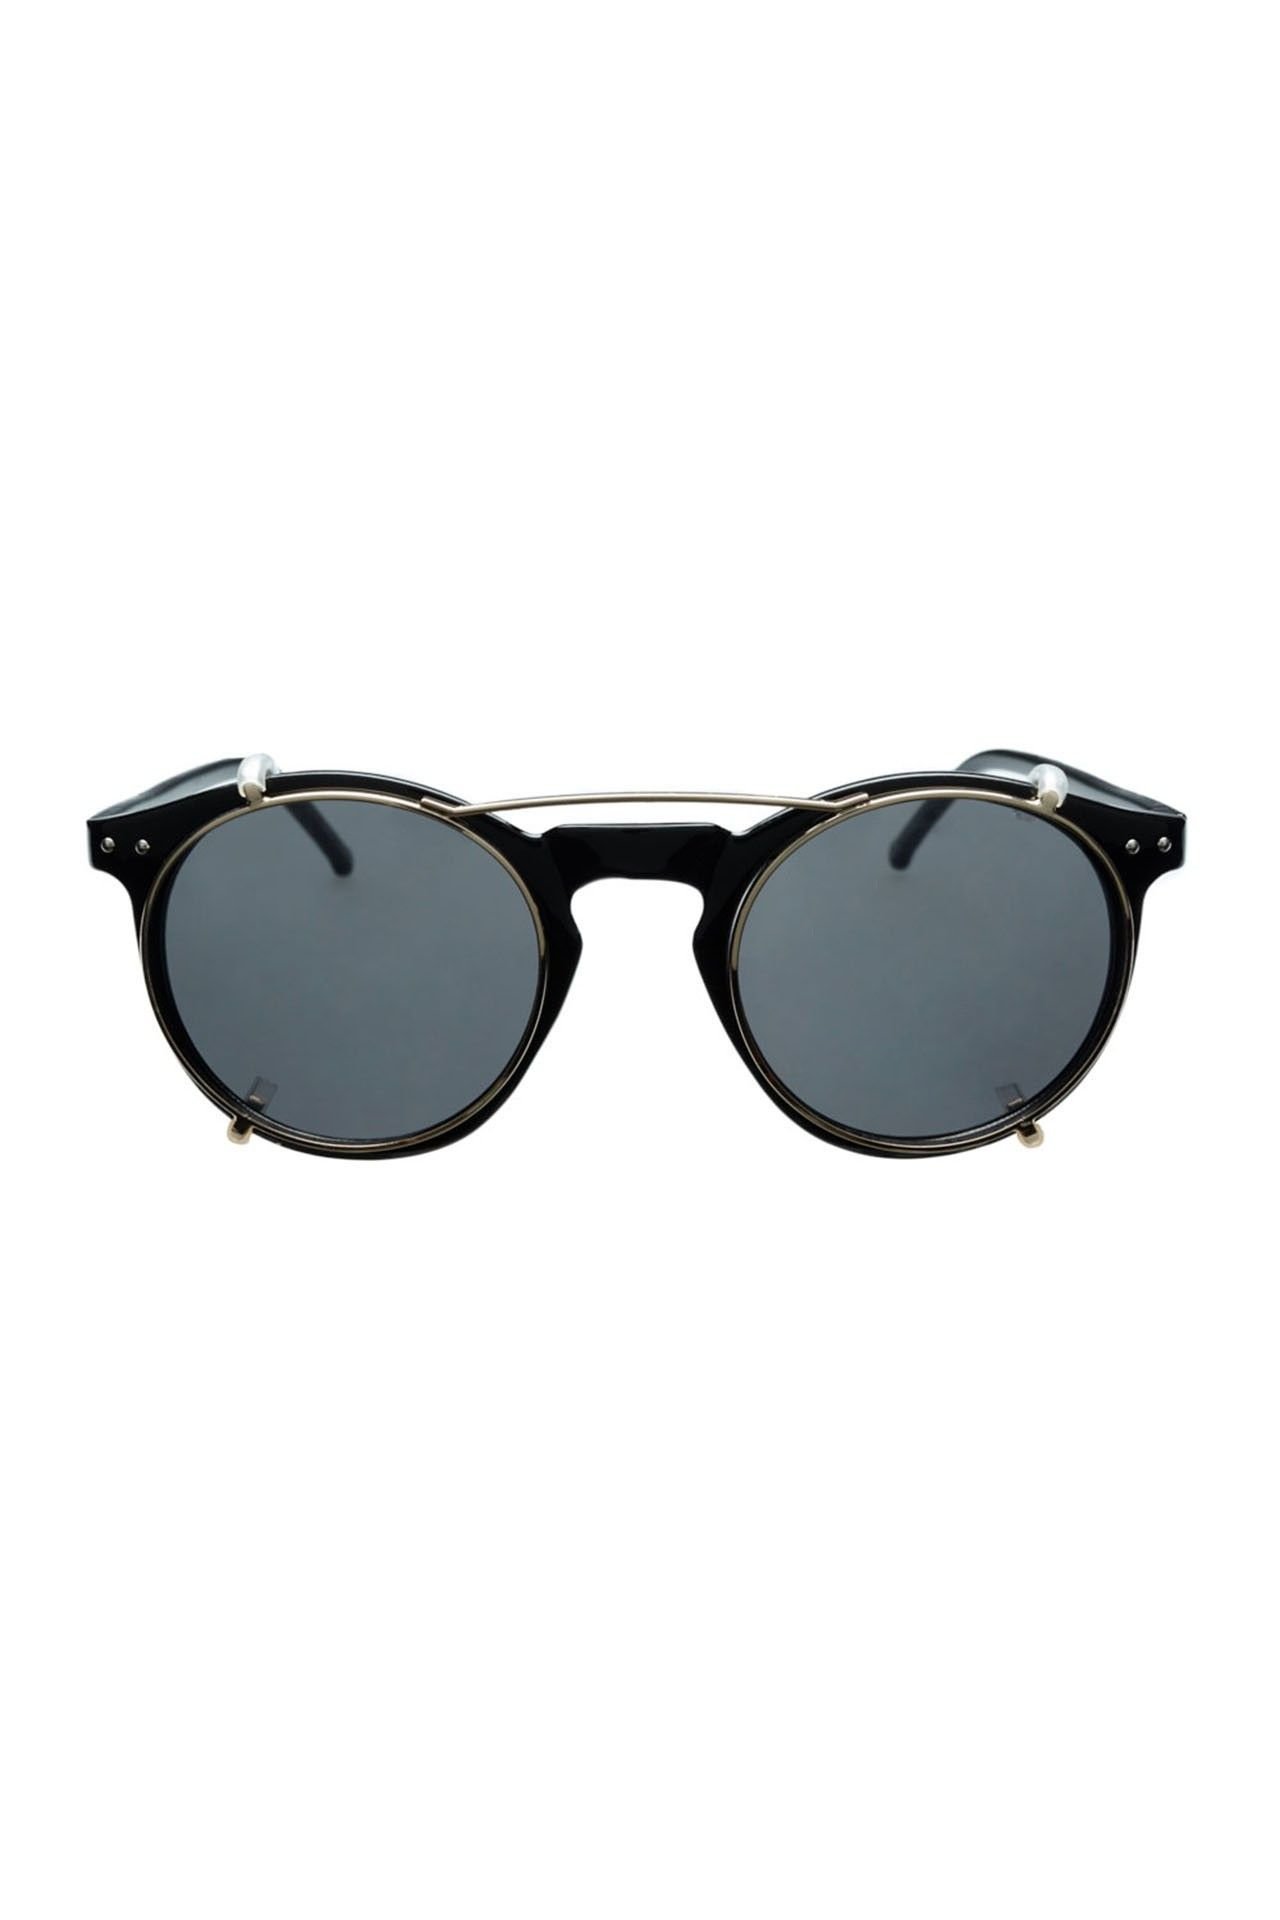 Afbeelding van Icon Eyewear Zonnebril M180921 Black- Clear A